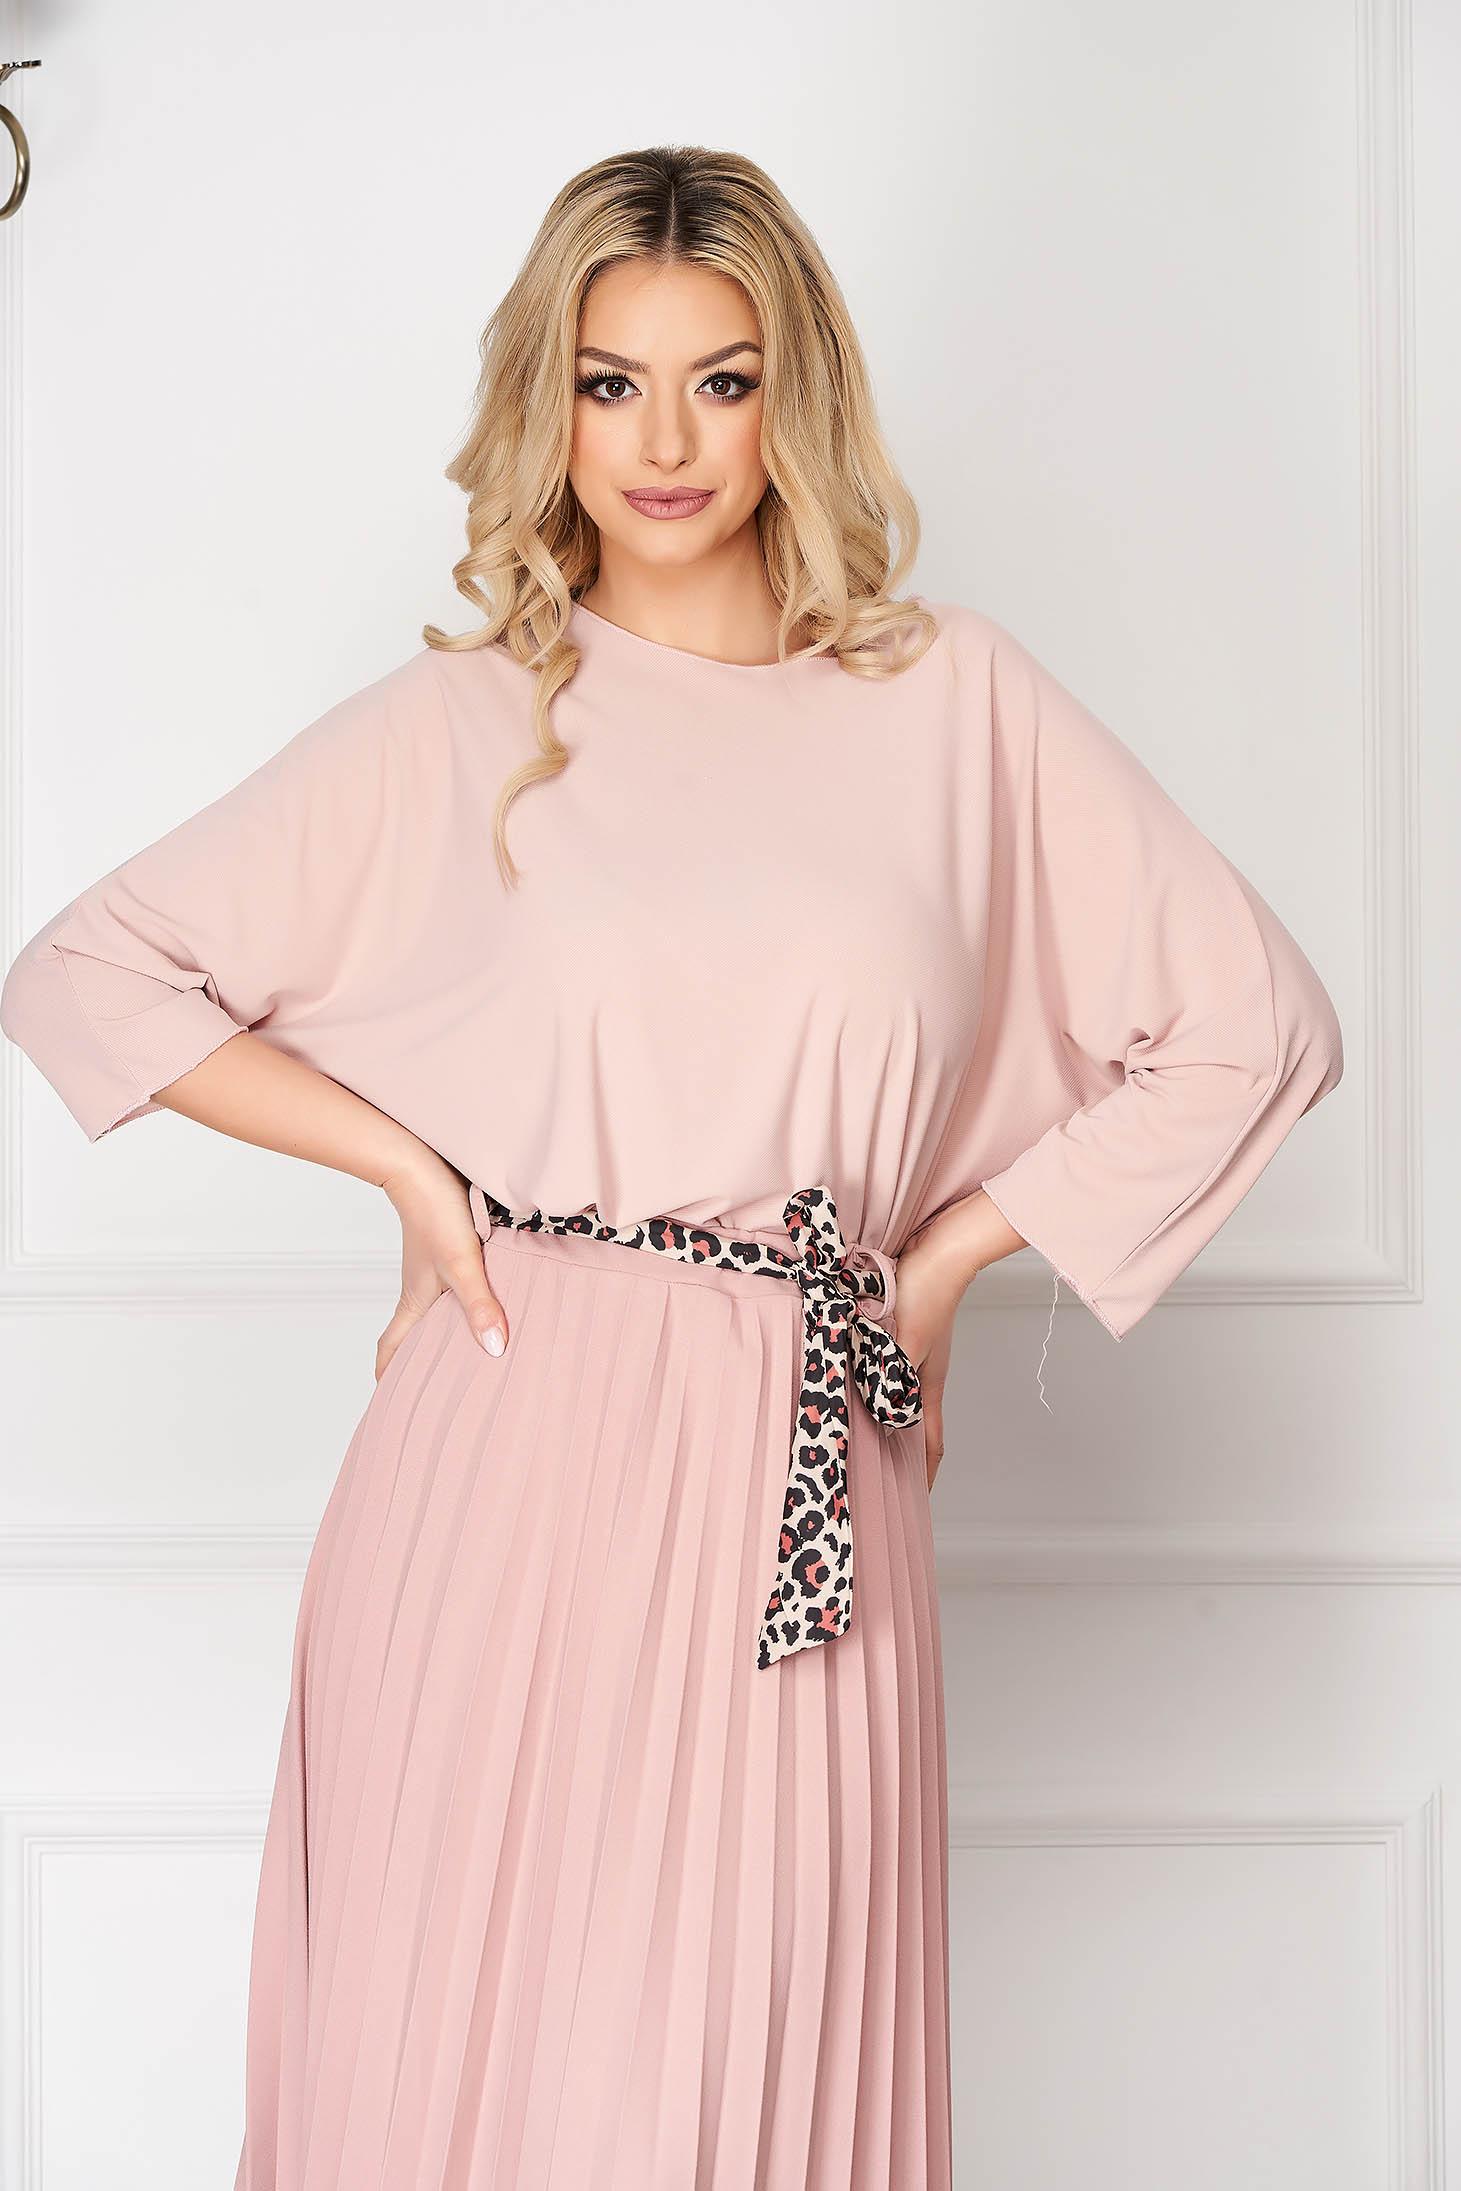 Bluza dama SunShine roz prafuit casual scurta asimetrica cu croi larg